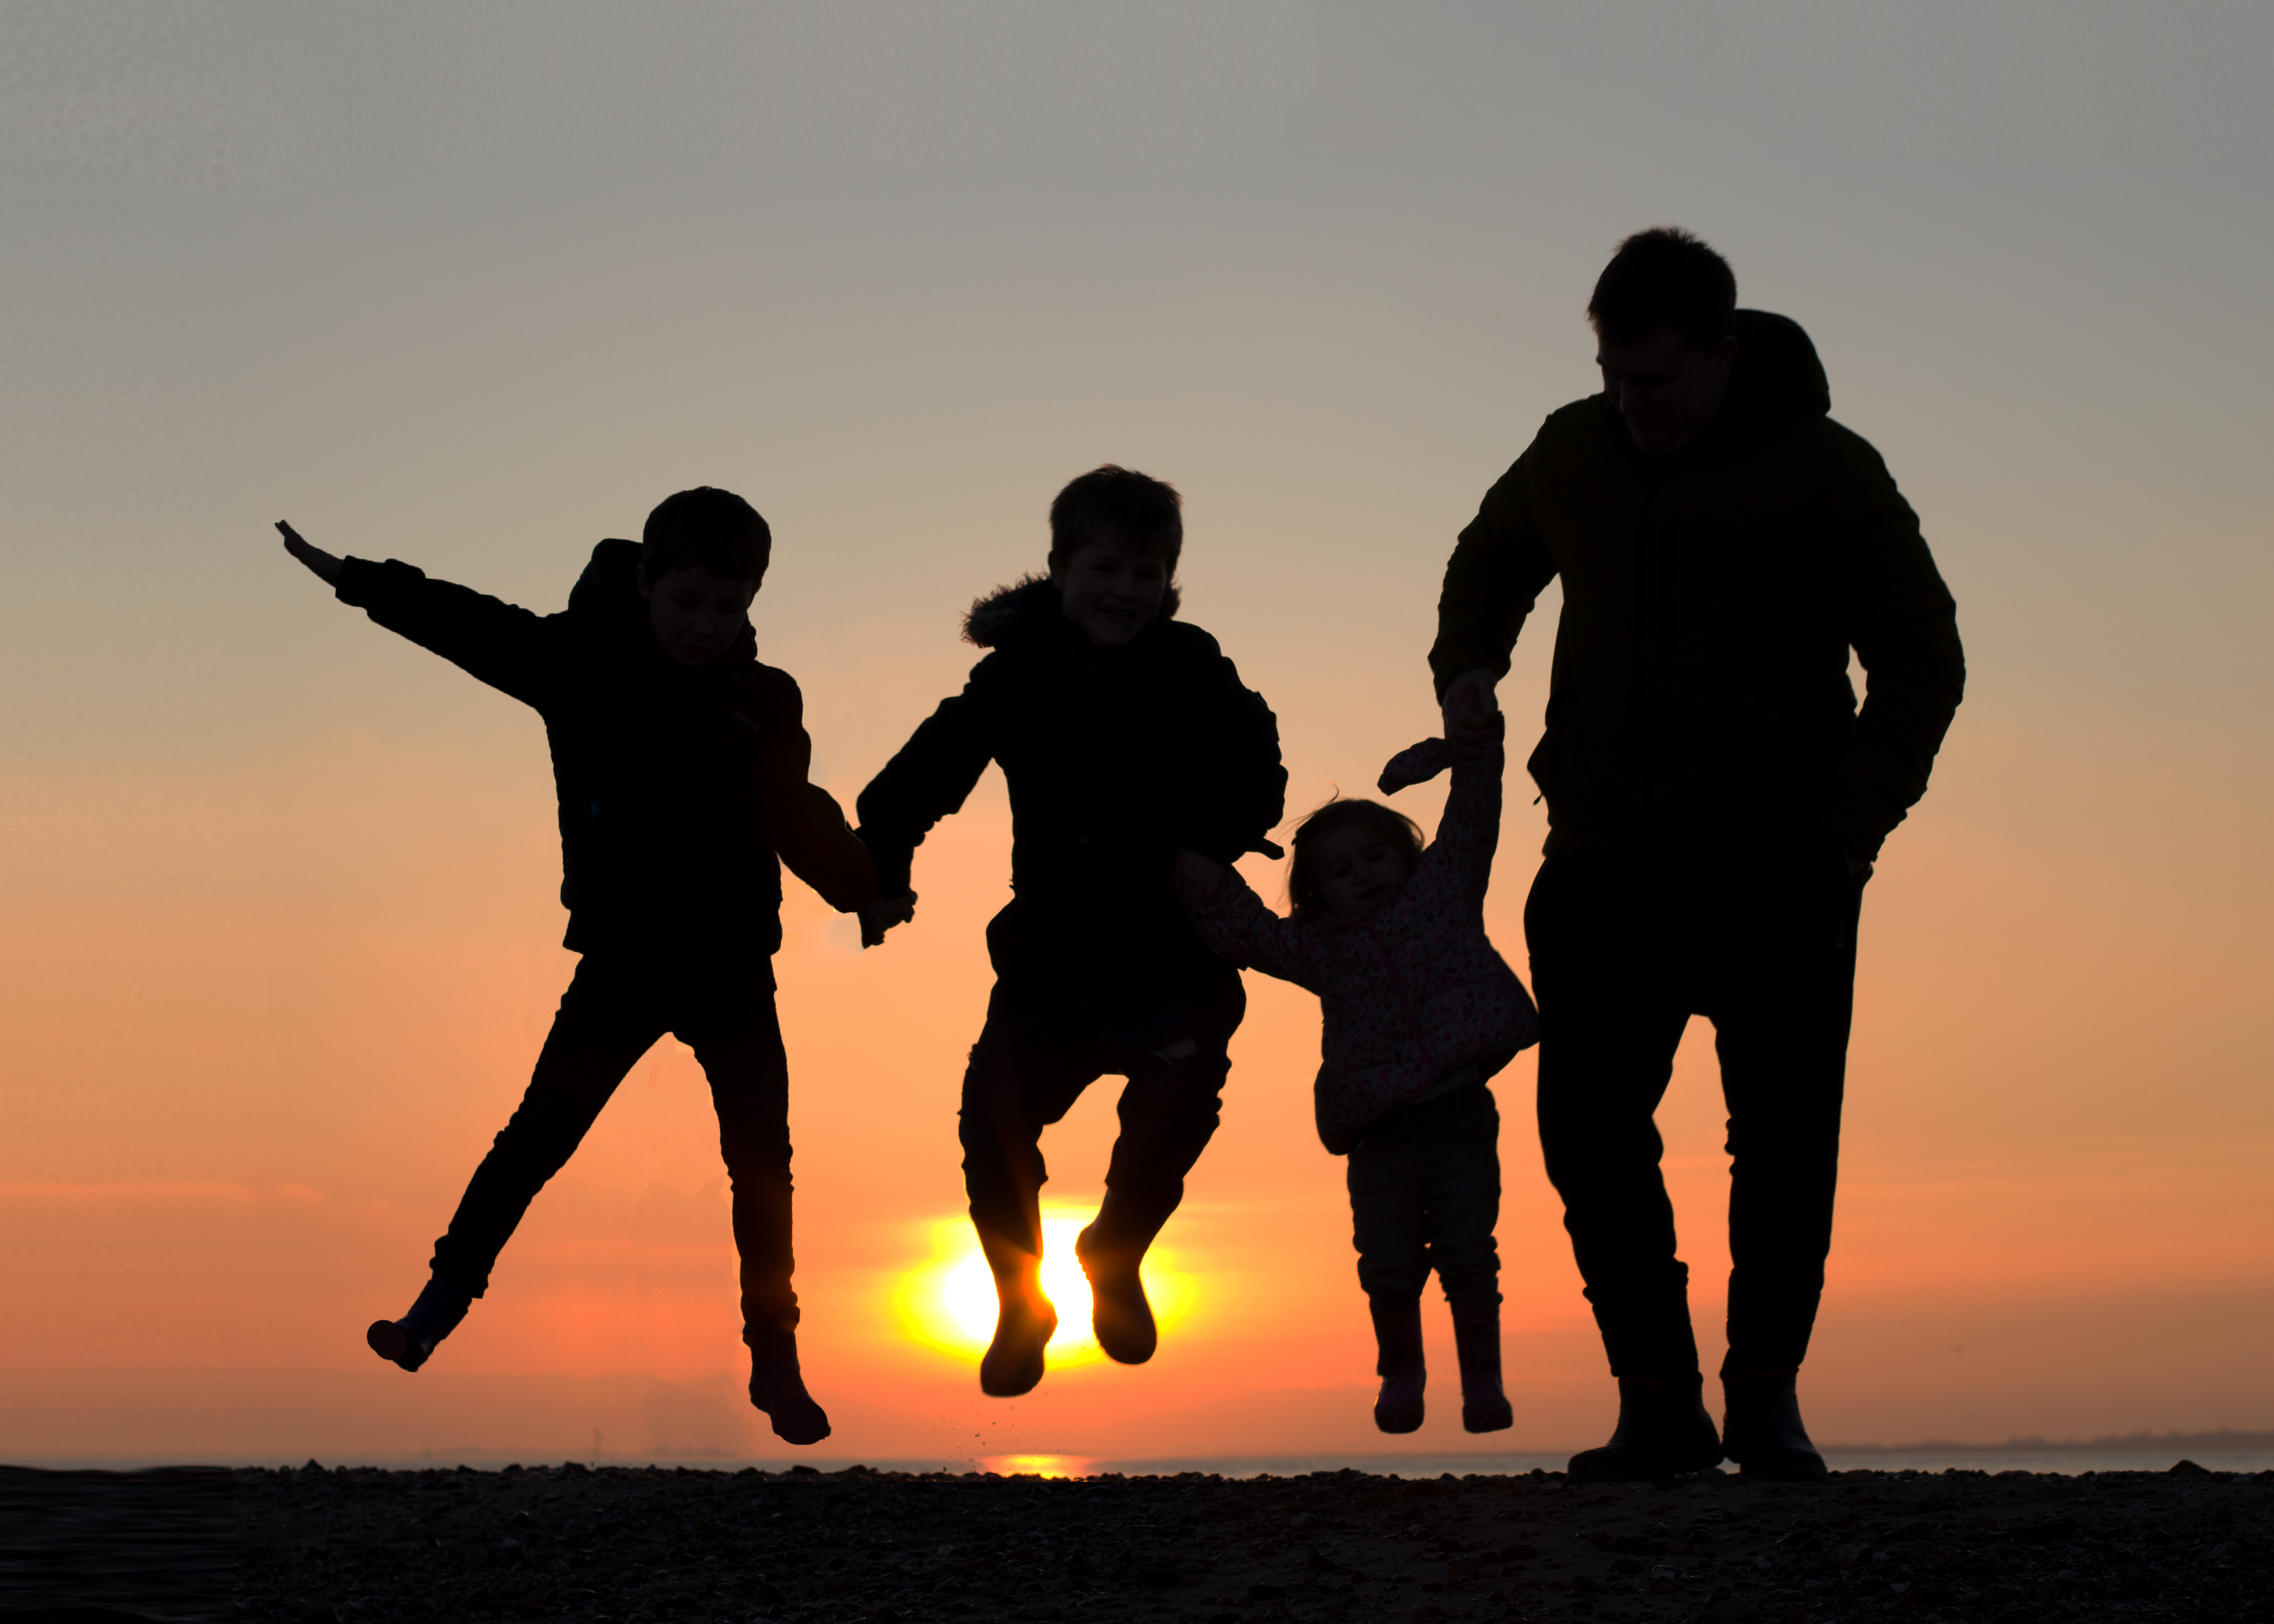 family sunset silouhette